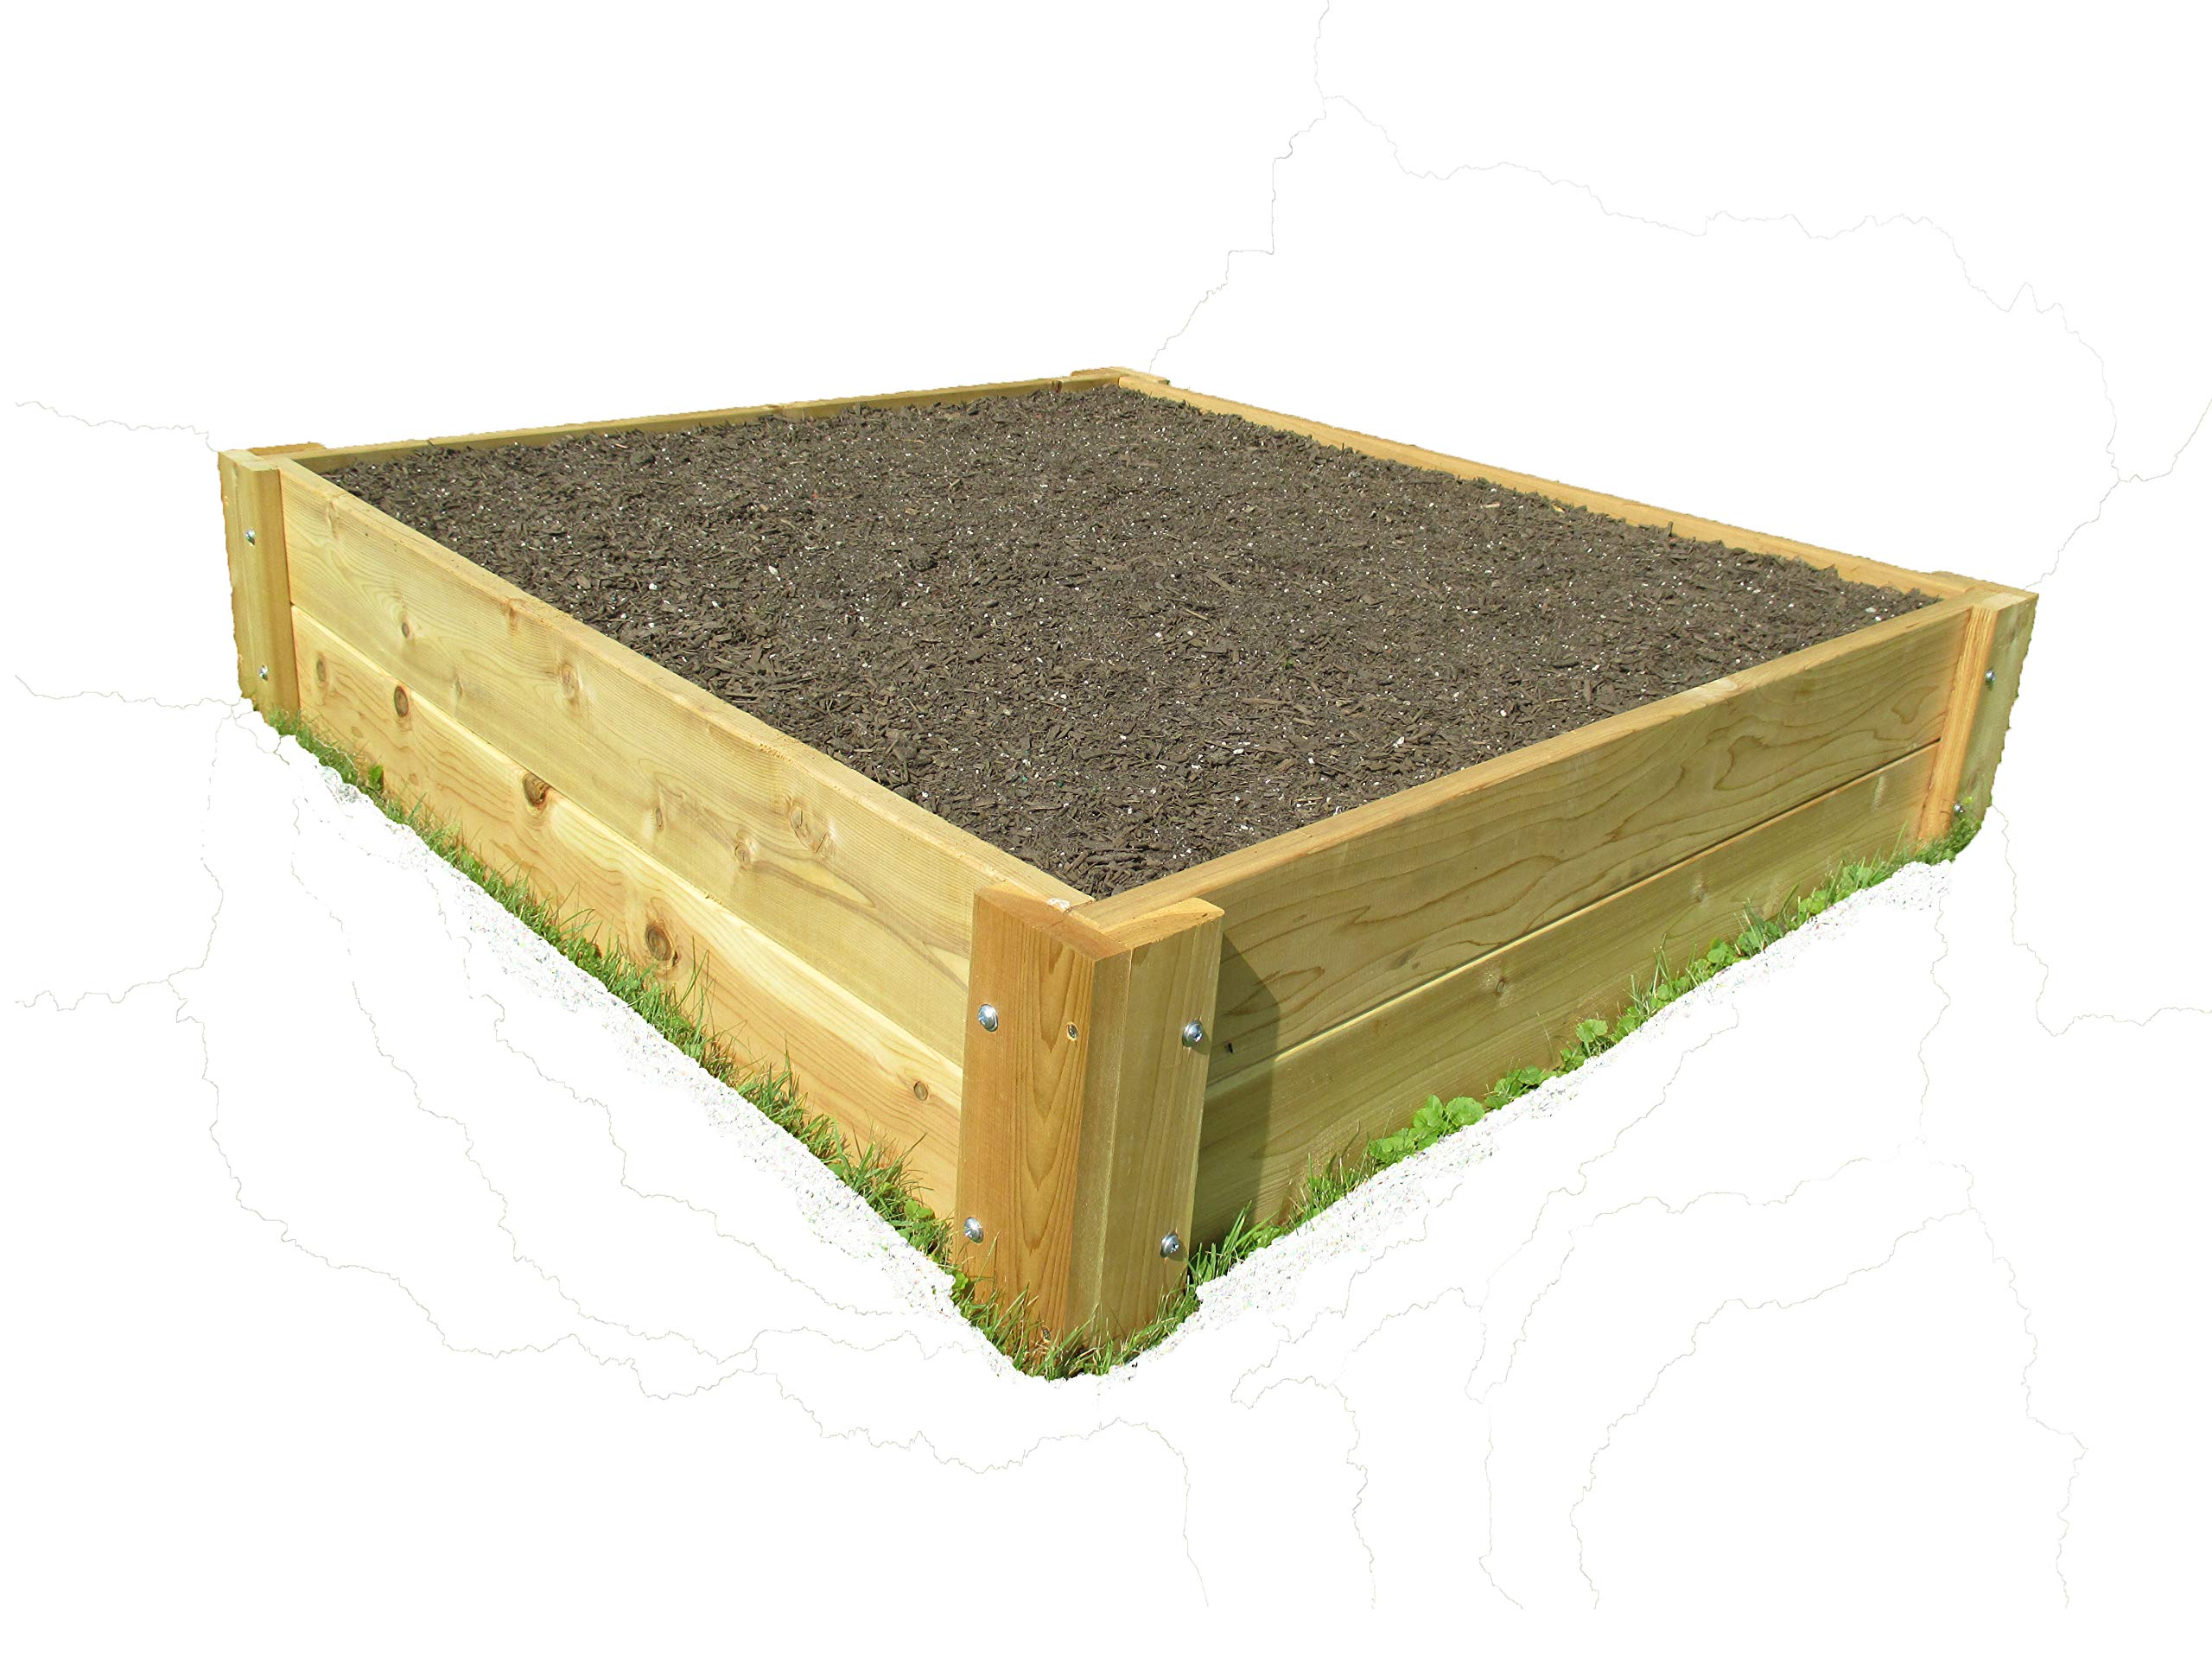 Infinite Cedar Raised Bed Garden Kit 4'x4'x11